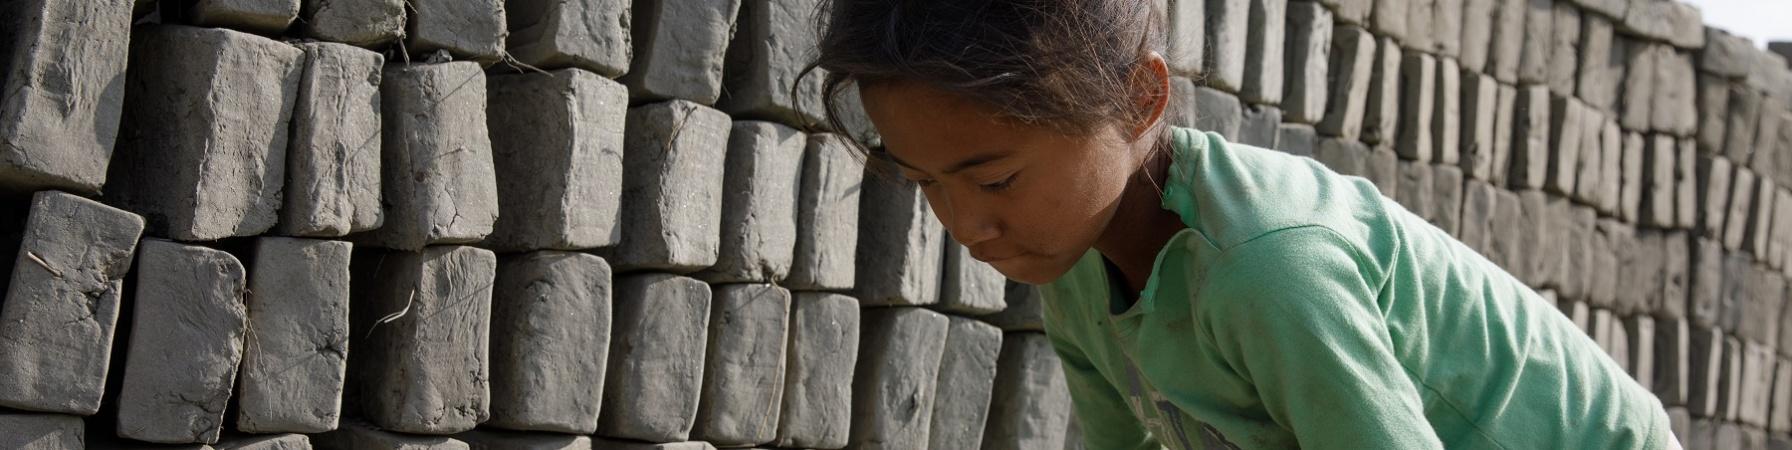 Bambina nepalese sposta mattoni in una fornace di fabbricazione